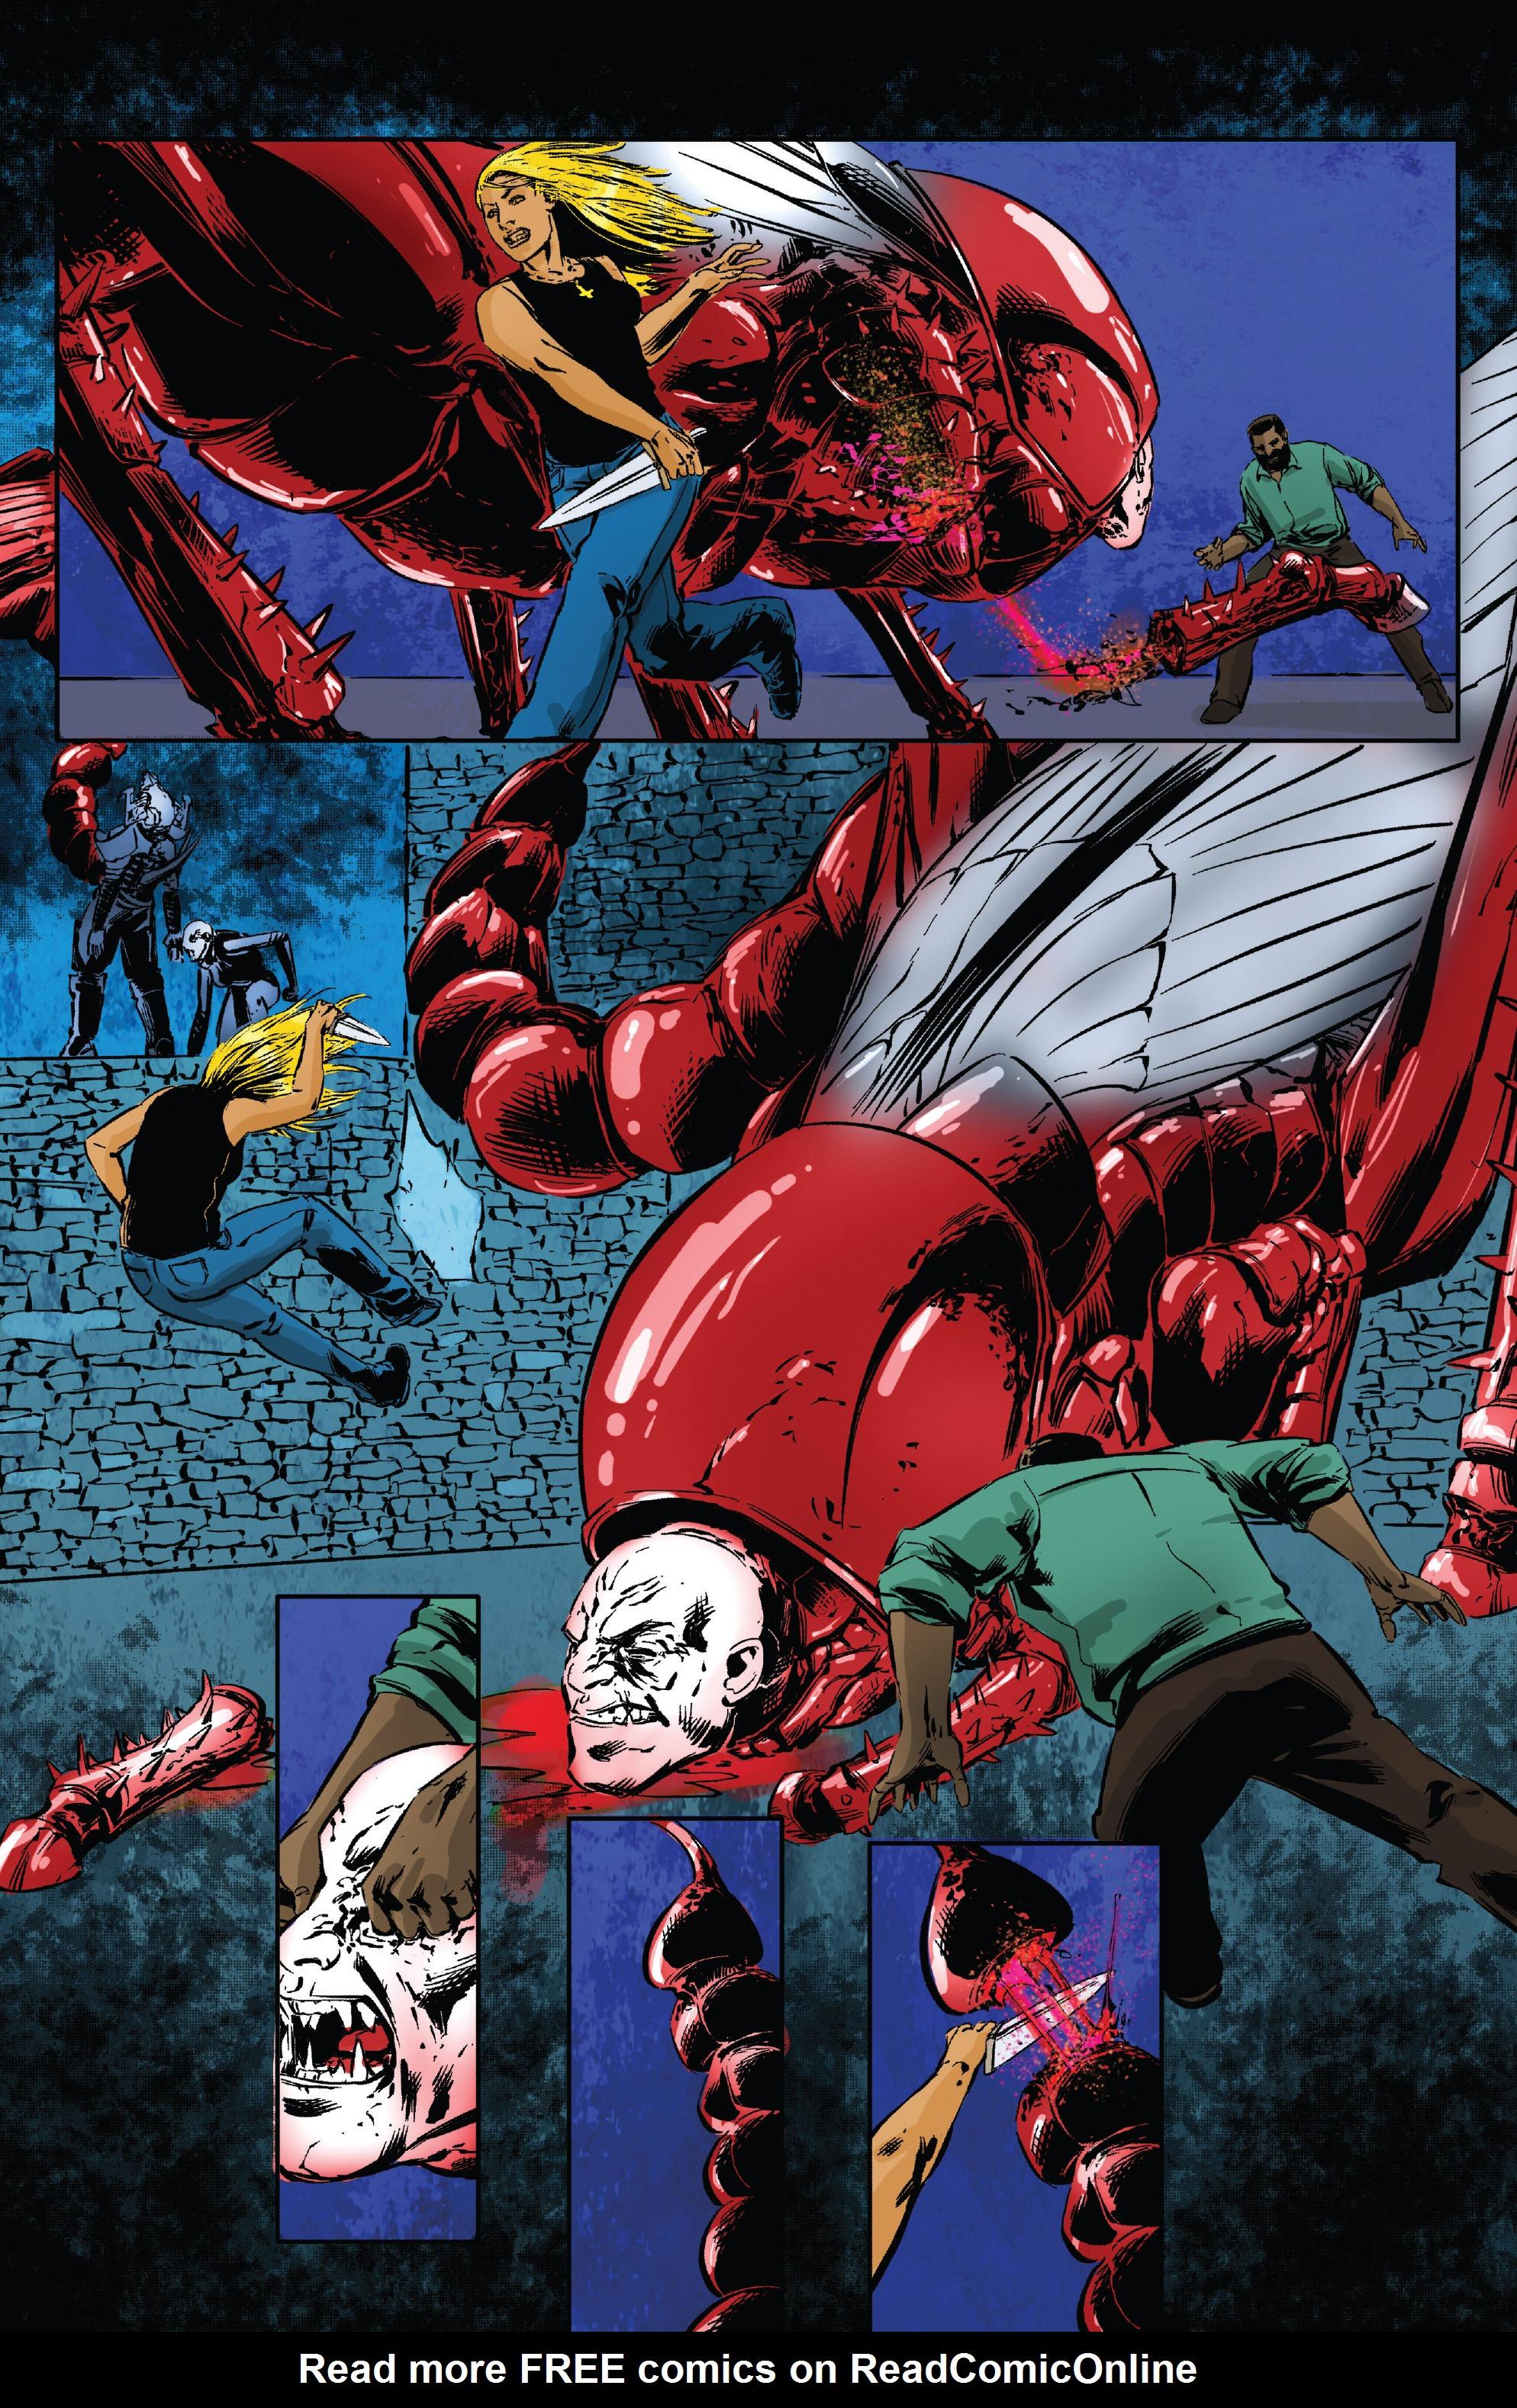 Read online Clive Barker's Hellraiser: The Dark Watch comic -  Issue # TPB 3 - 53